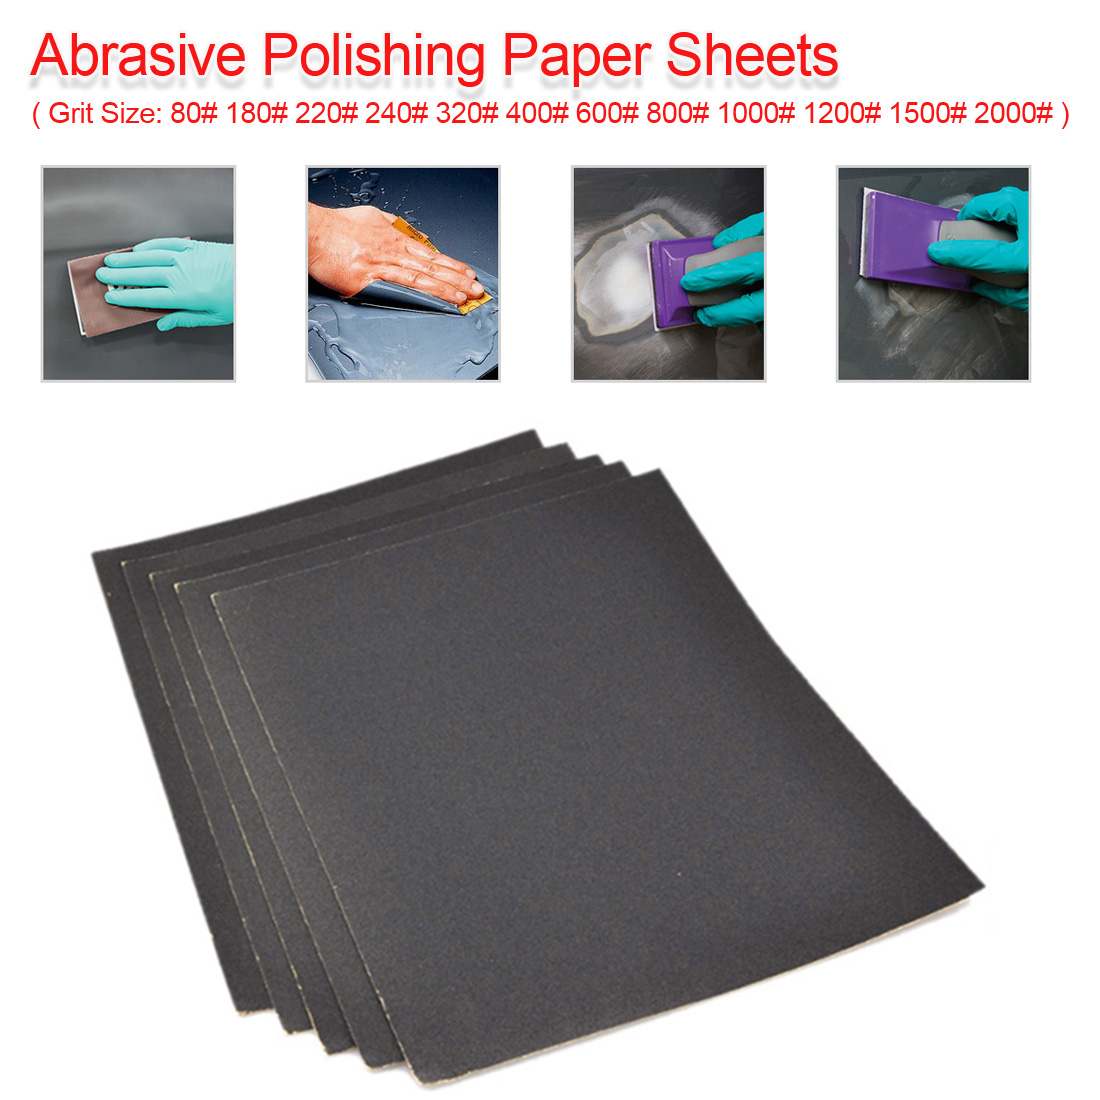 Grit 80-2000 Wet/Dry Polishing Sanding Abrasive Sandpaper Paper Sheets Surface Finishing Made For Amber/ Bodhi/ Carpentry